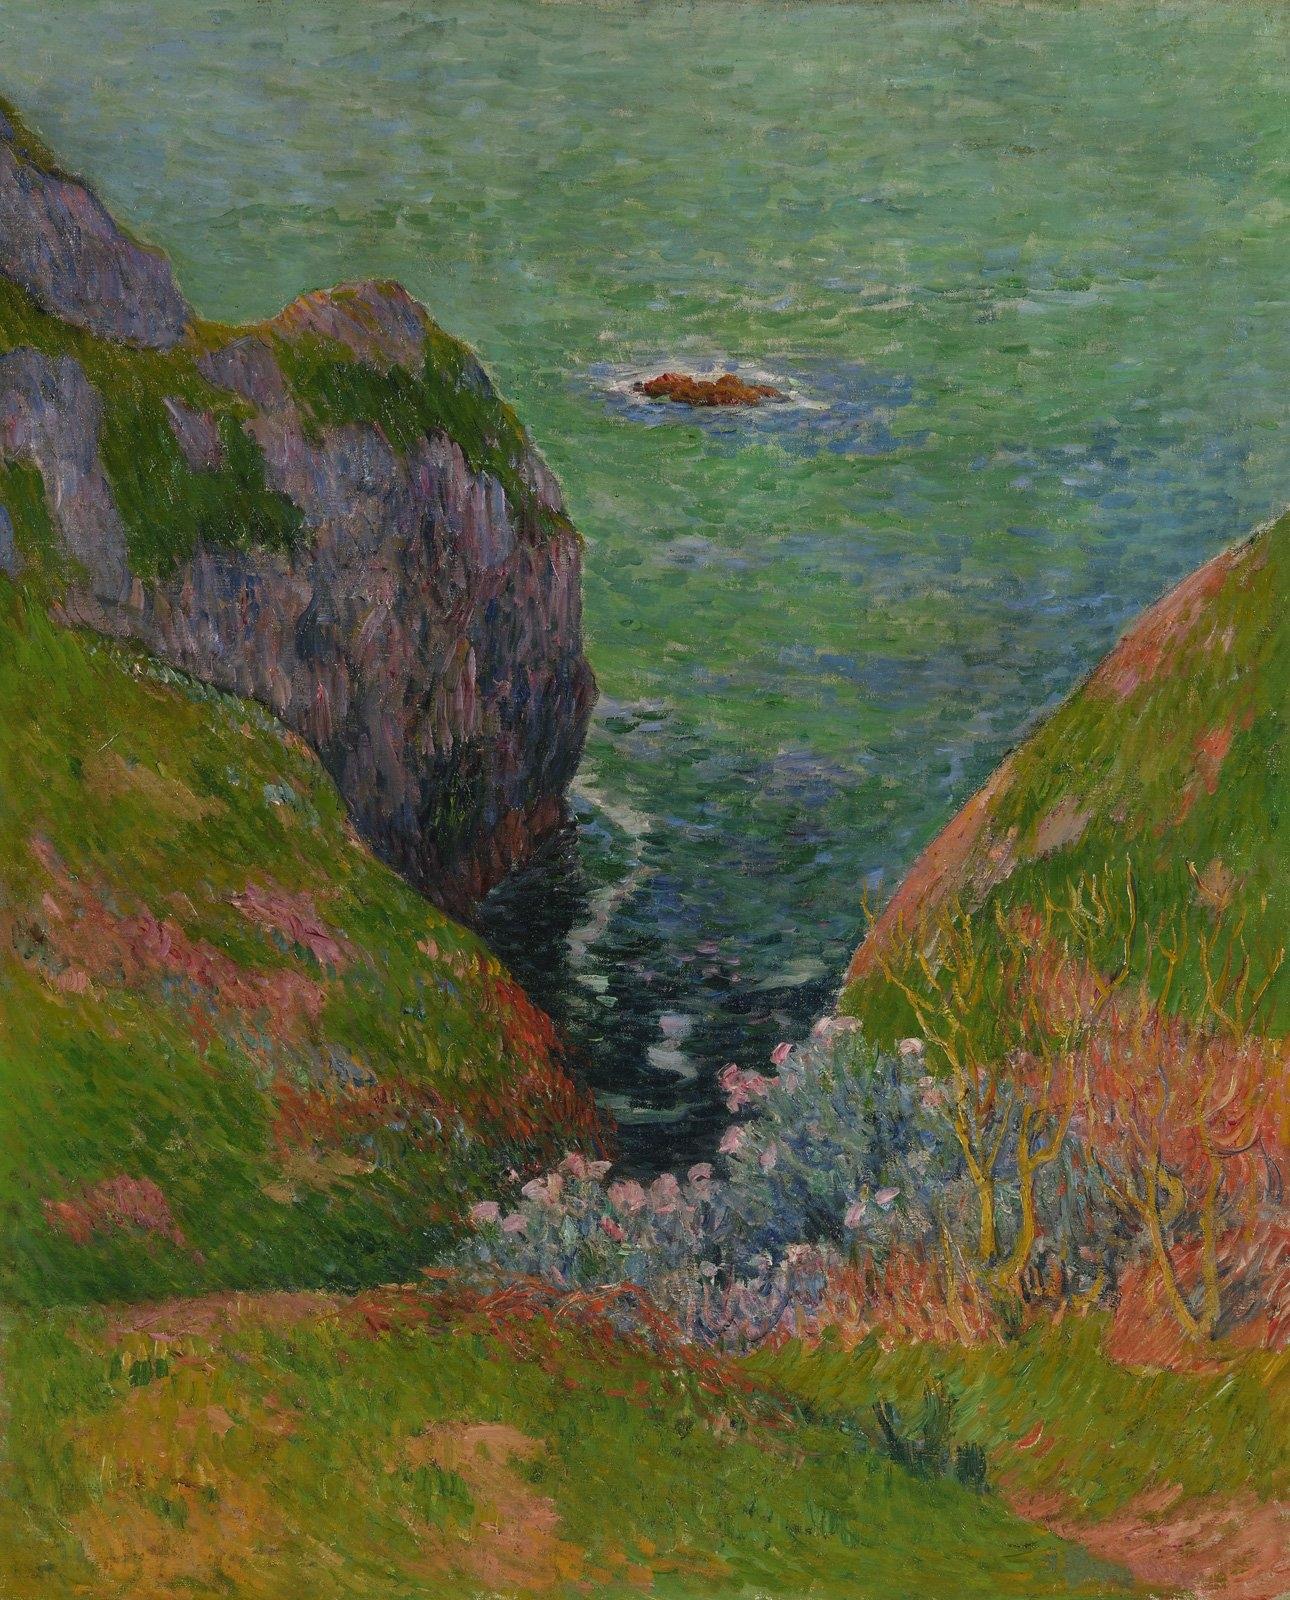 Анри Море на аукционах.: lilac2012 — LiveJournal